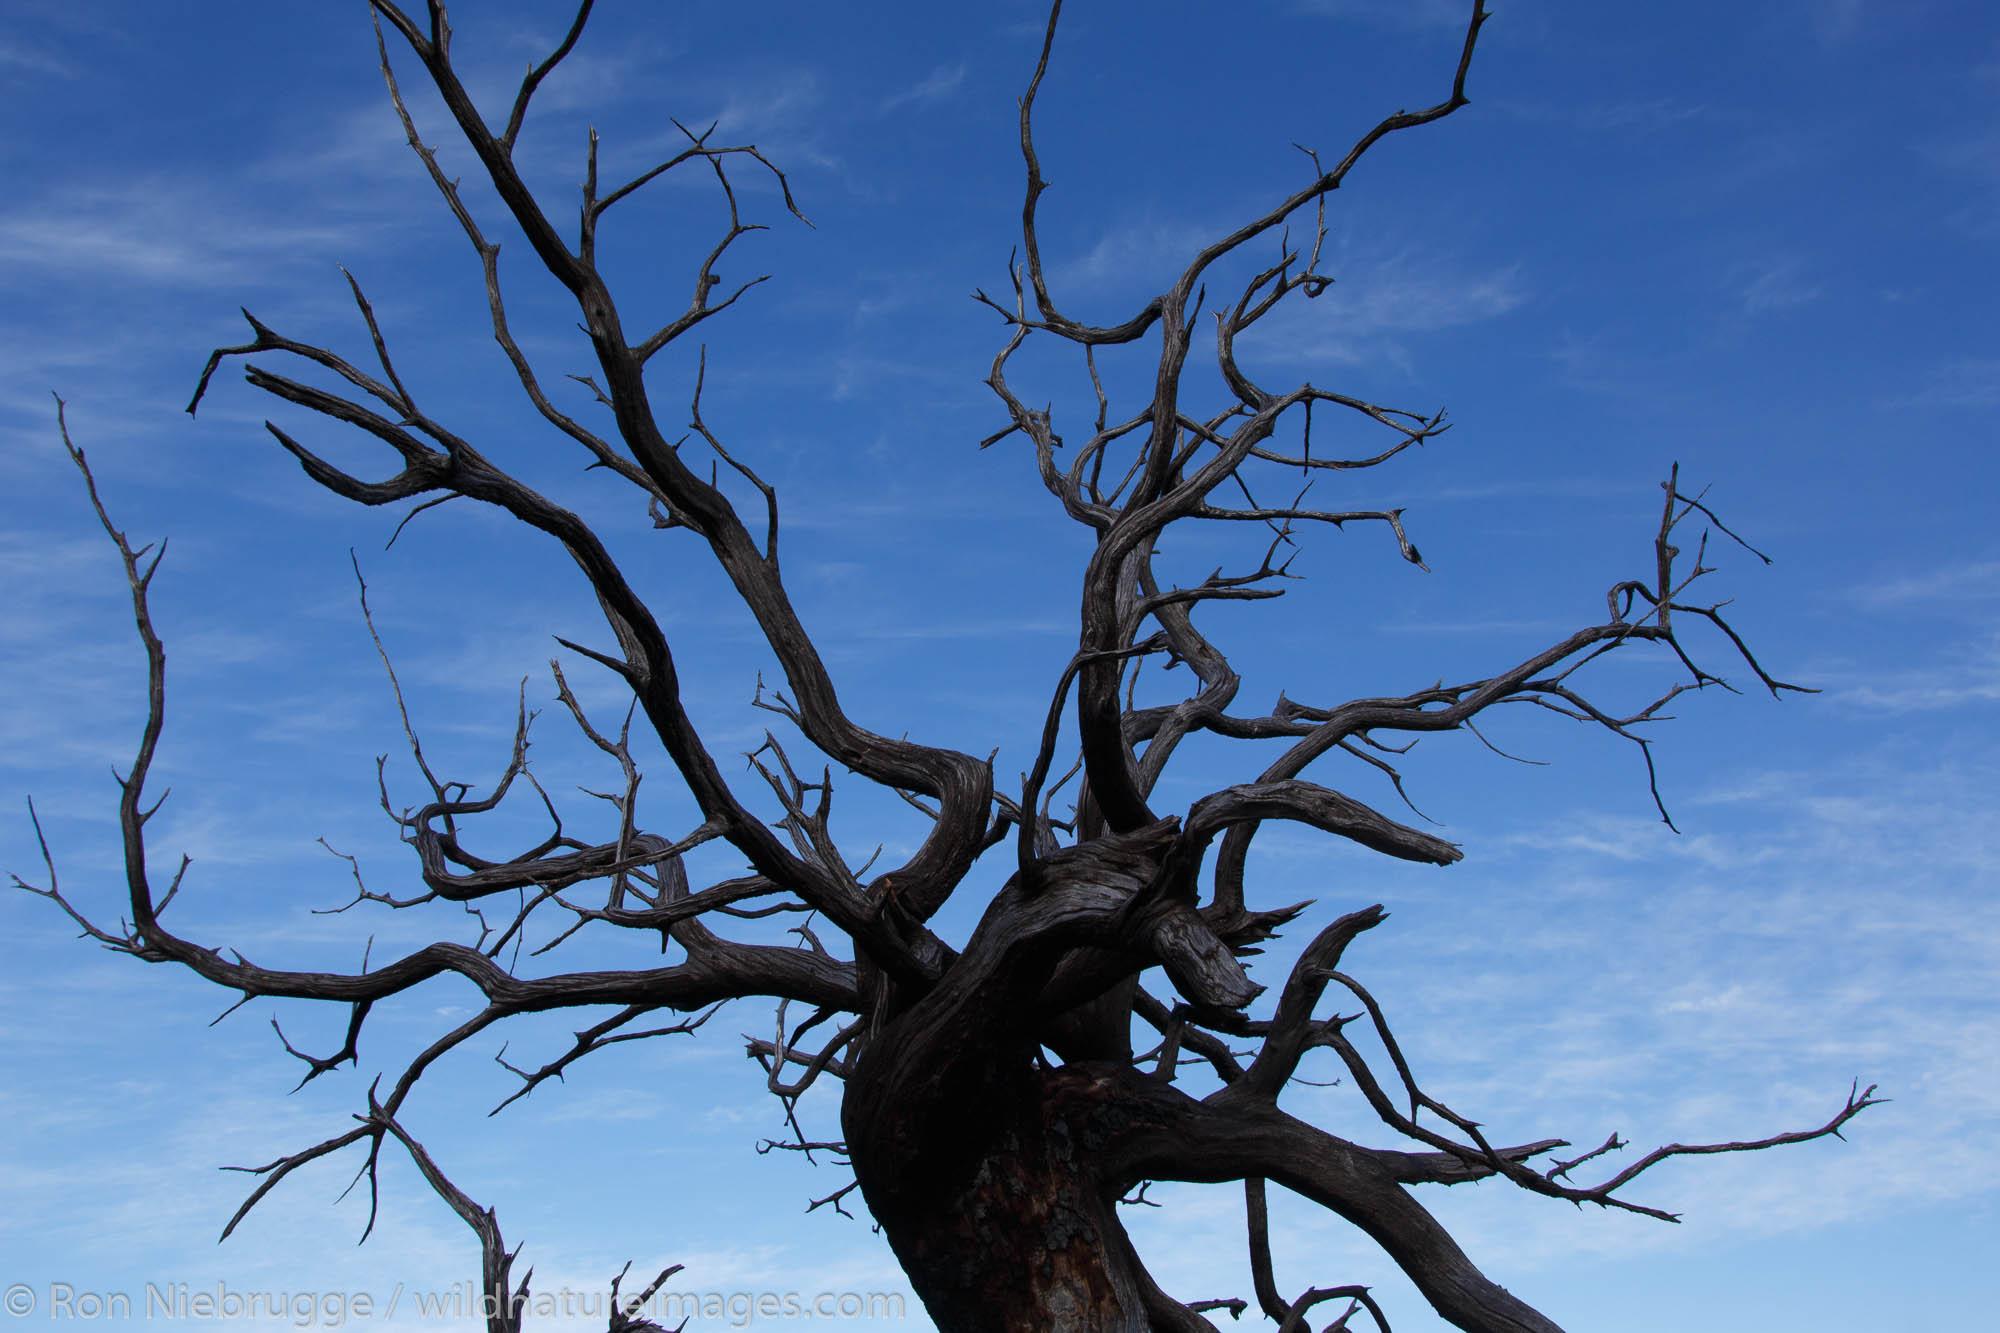 Dead tree, Anza-Borrego Desert State Park, California.